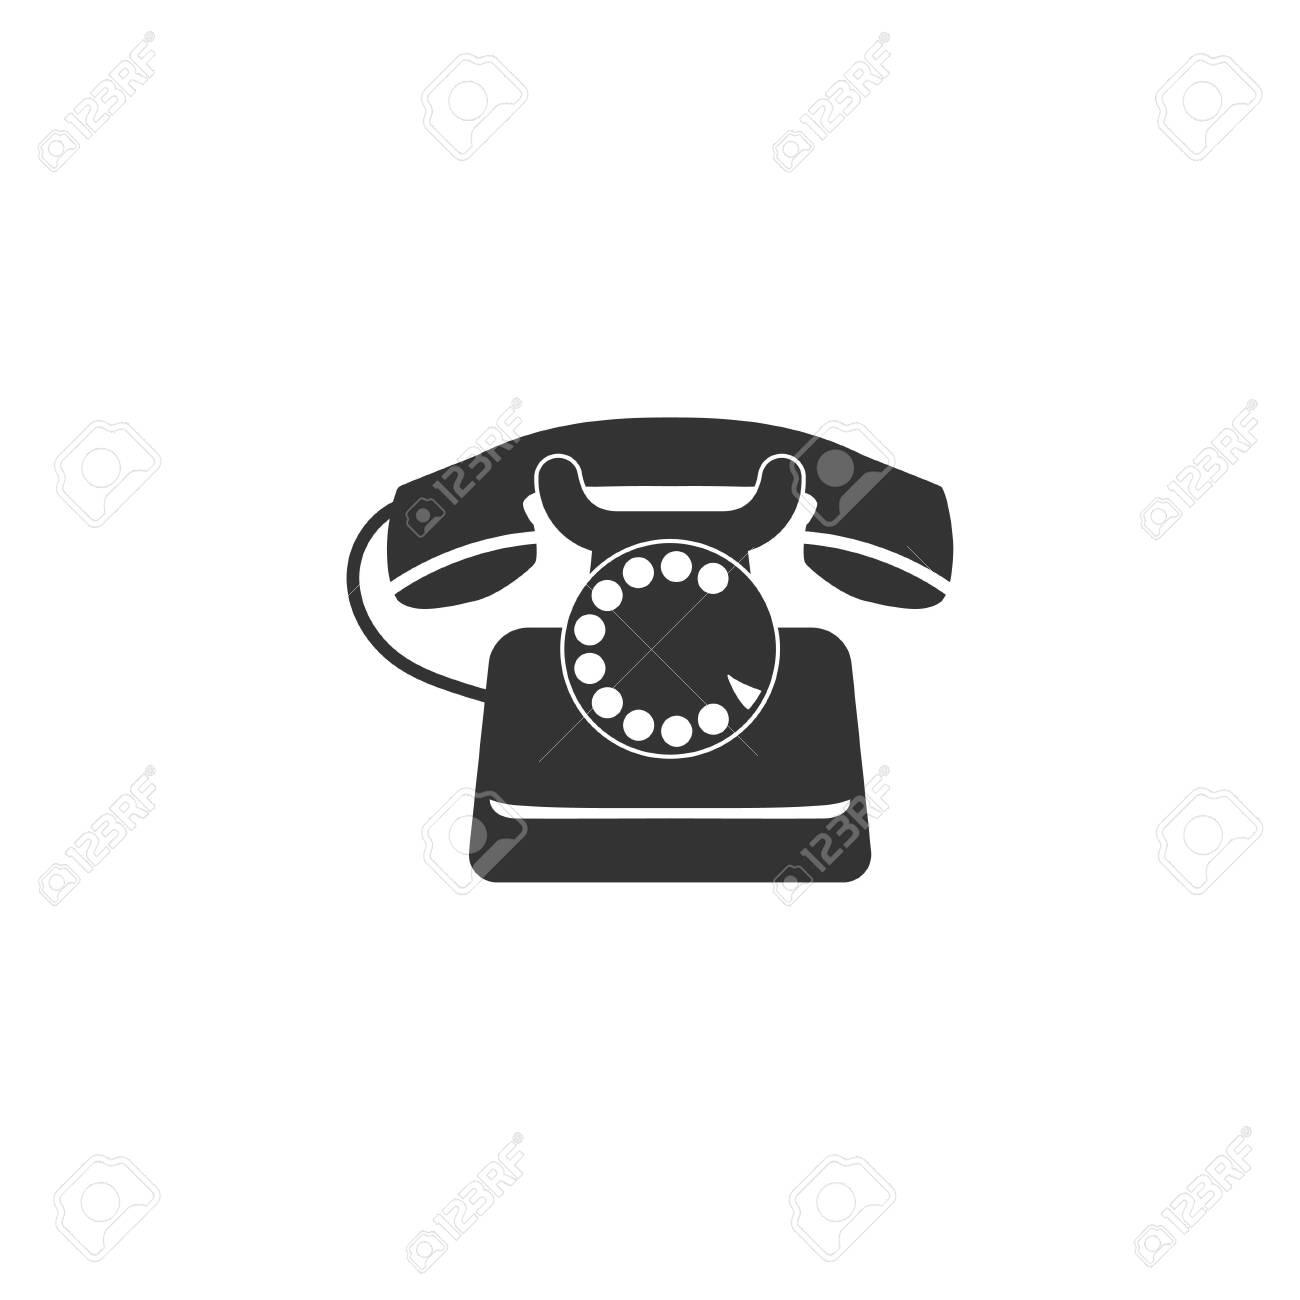 Retro phone icon in simple design  Vector illustration